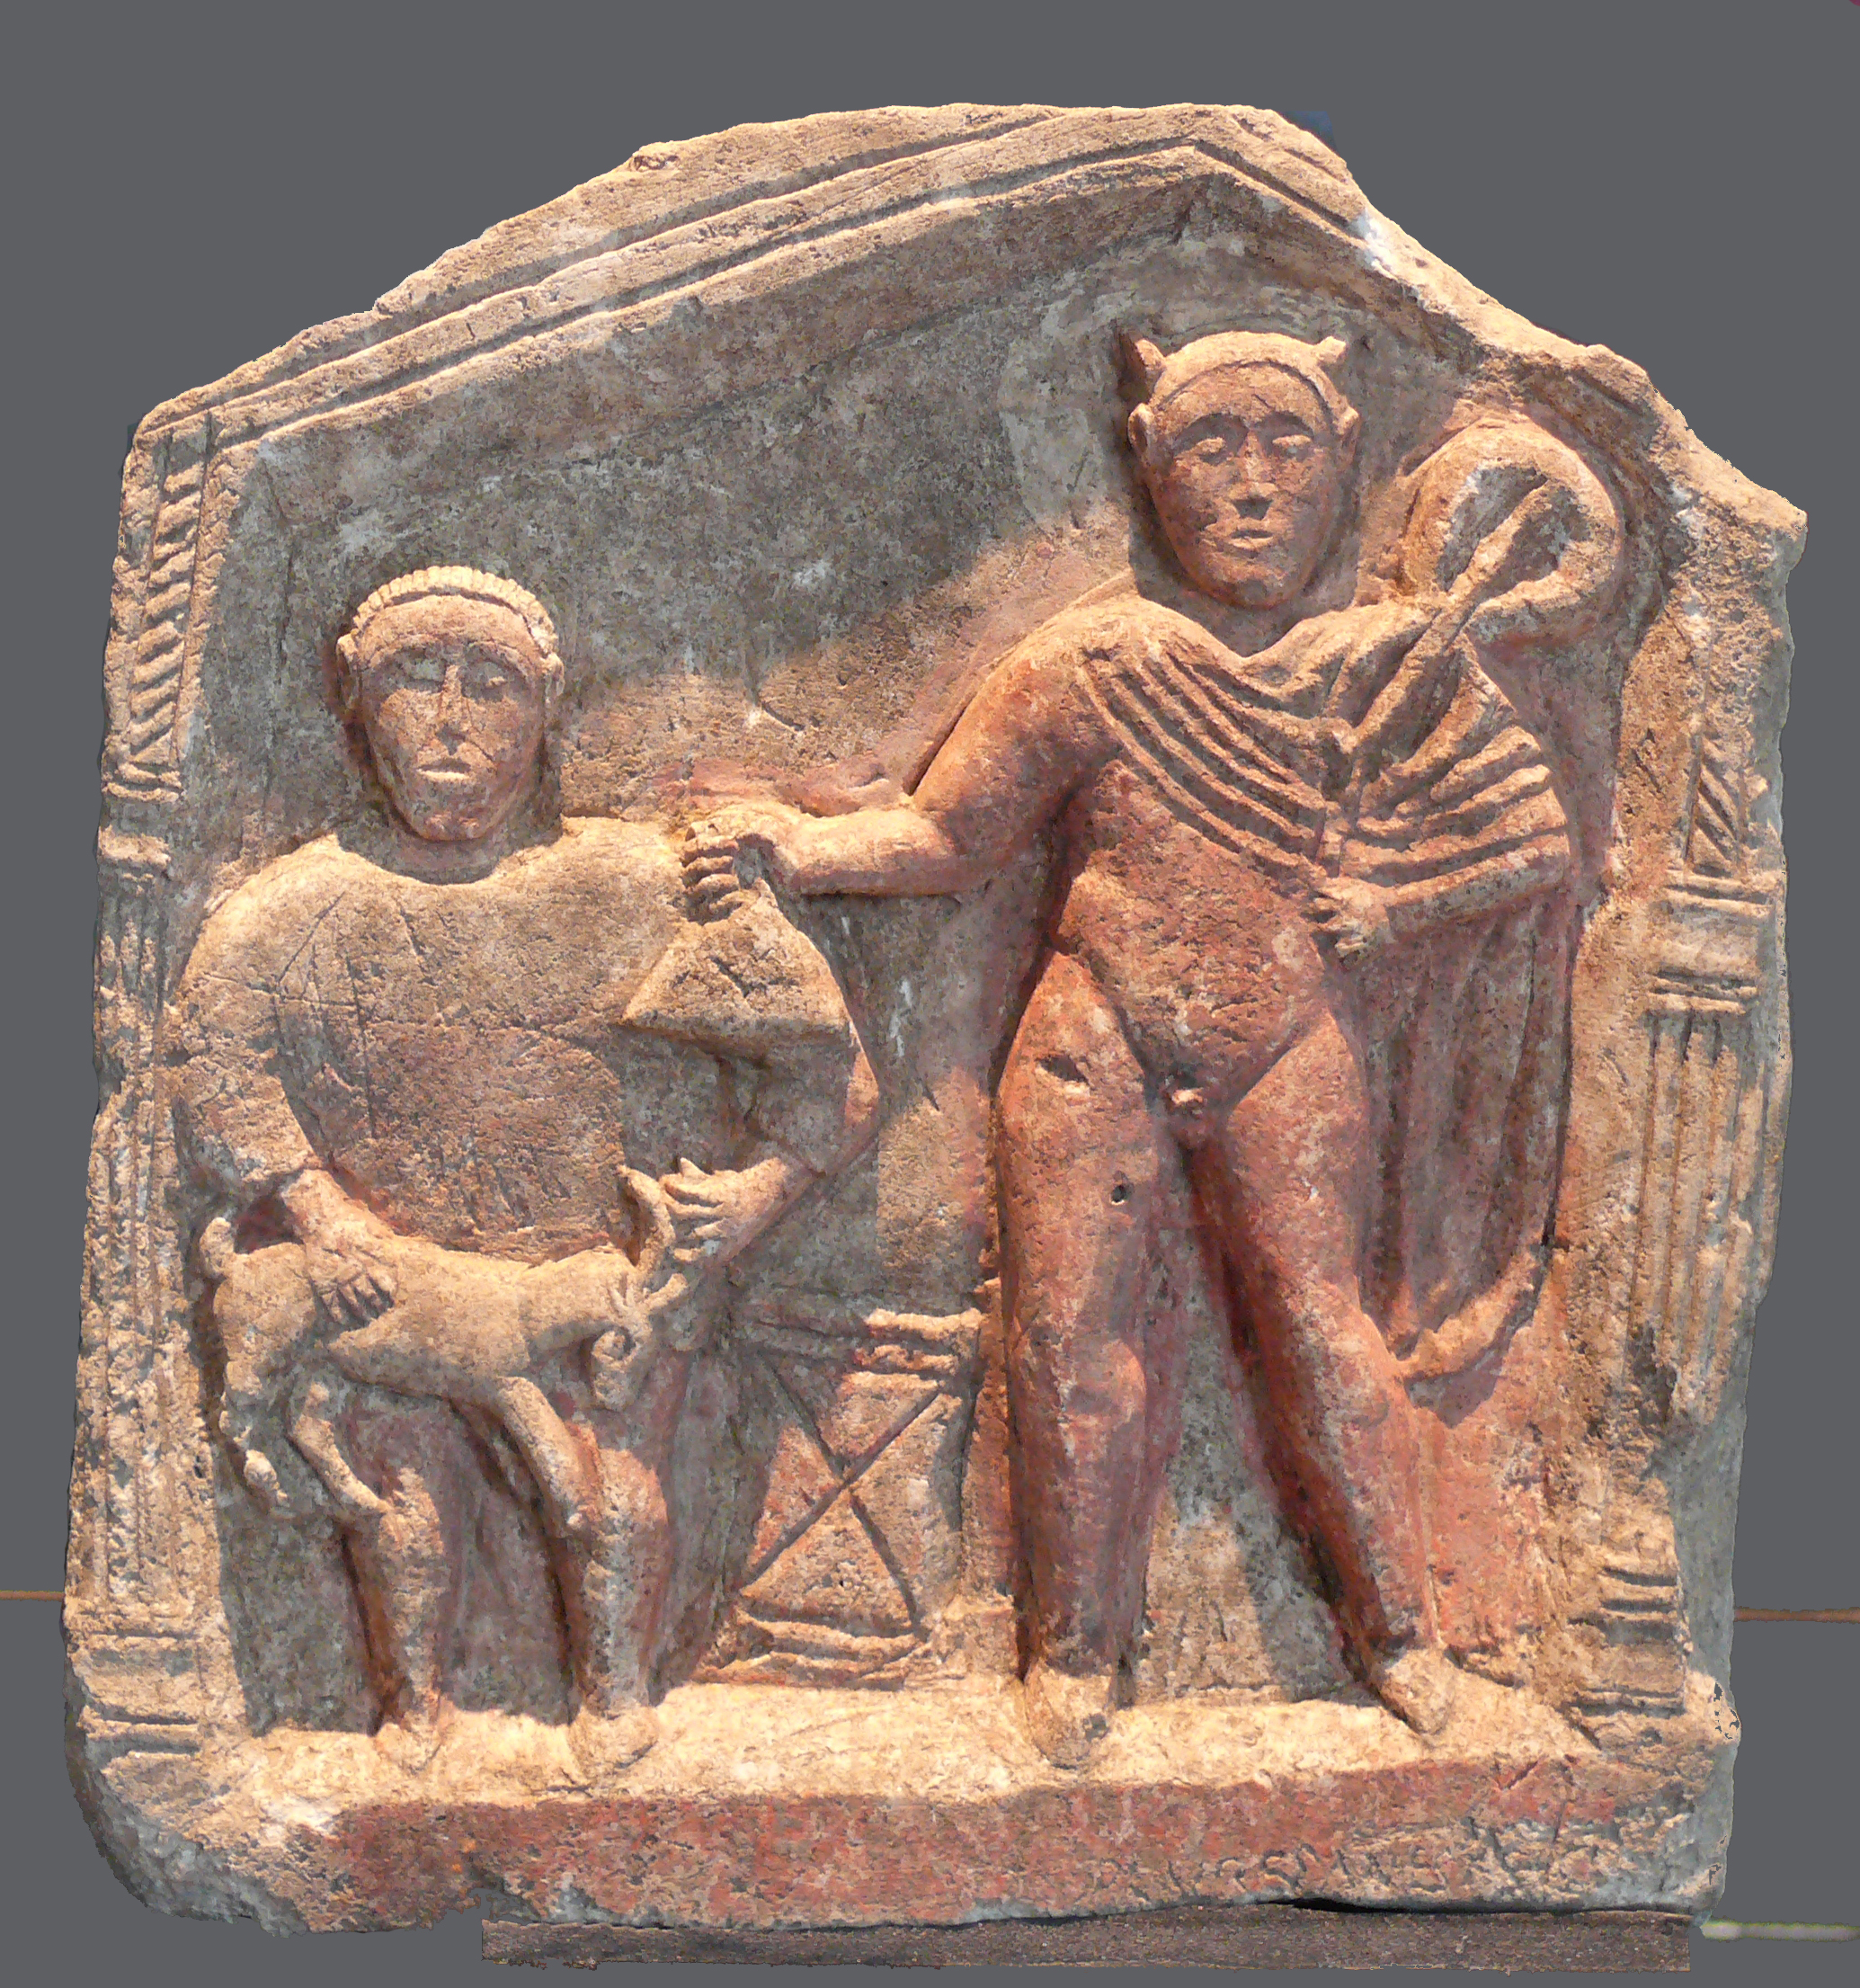 File:Mercury (deity) relief.jpg - Wikimedia Commons